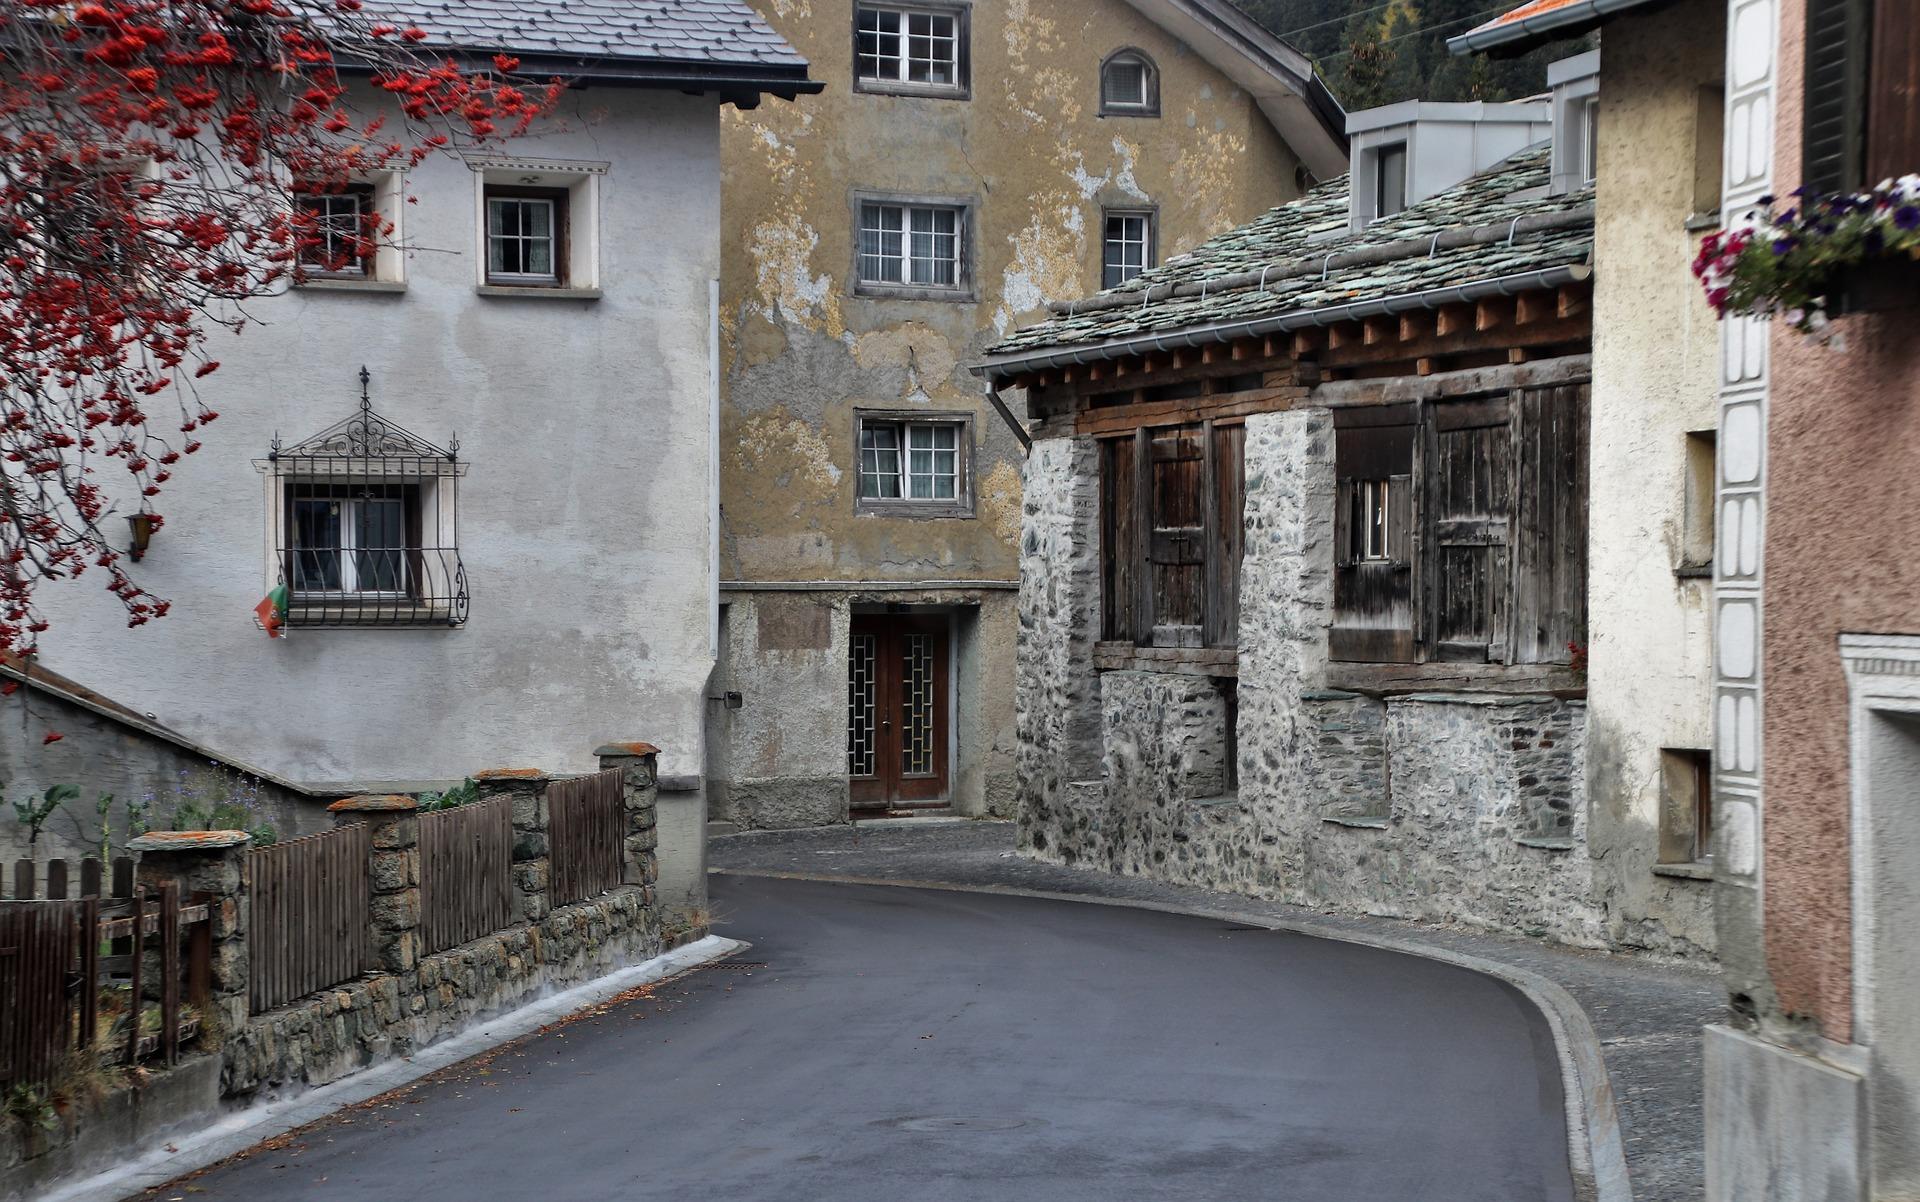 Daniele Natalizia | DNSGR | Casa vecchia